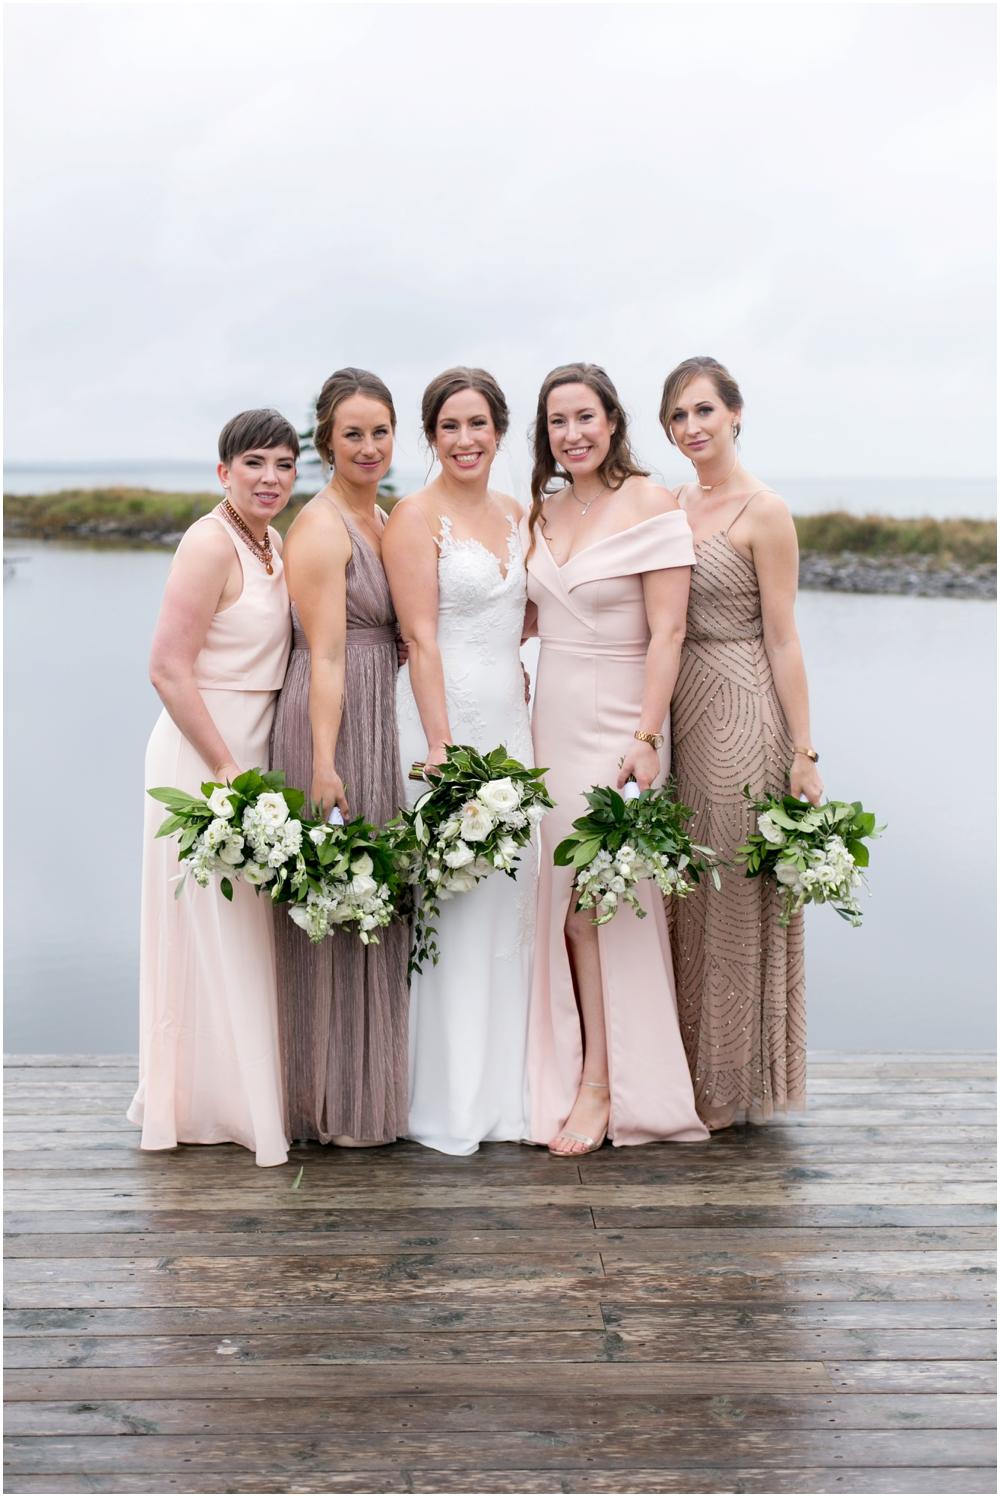 Gahan-House-Wedding-Chantal-Routhier-Photography_0027.jpg